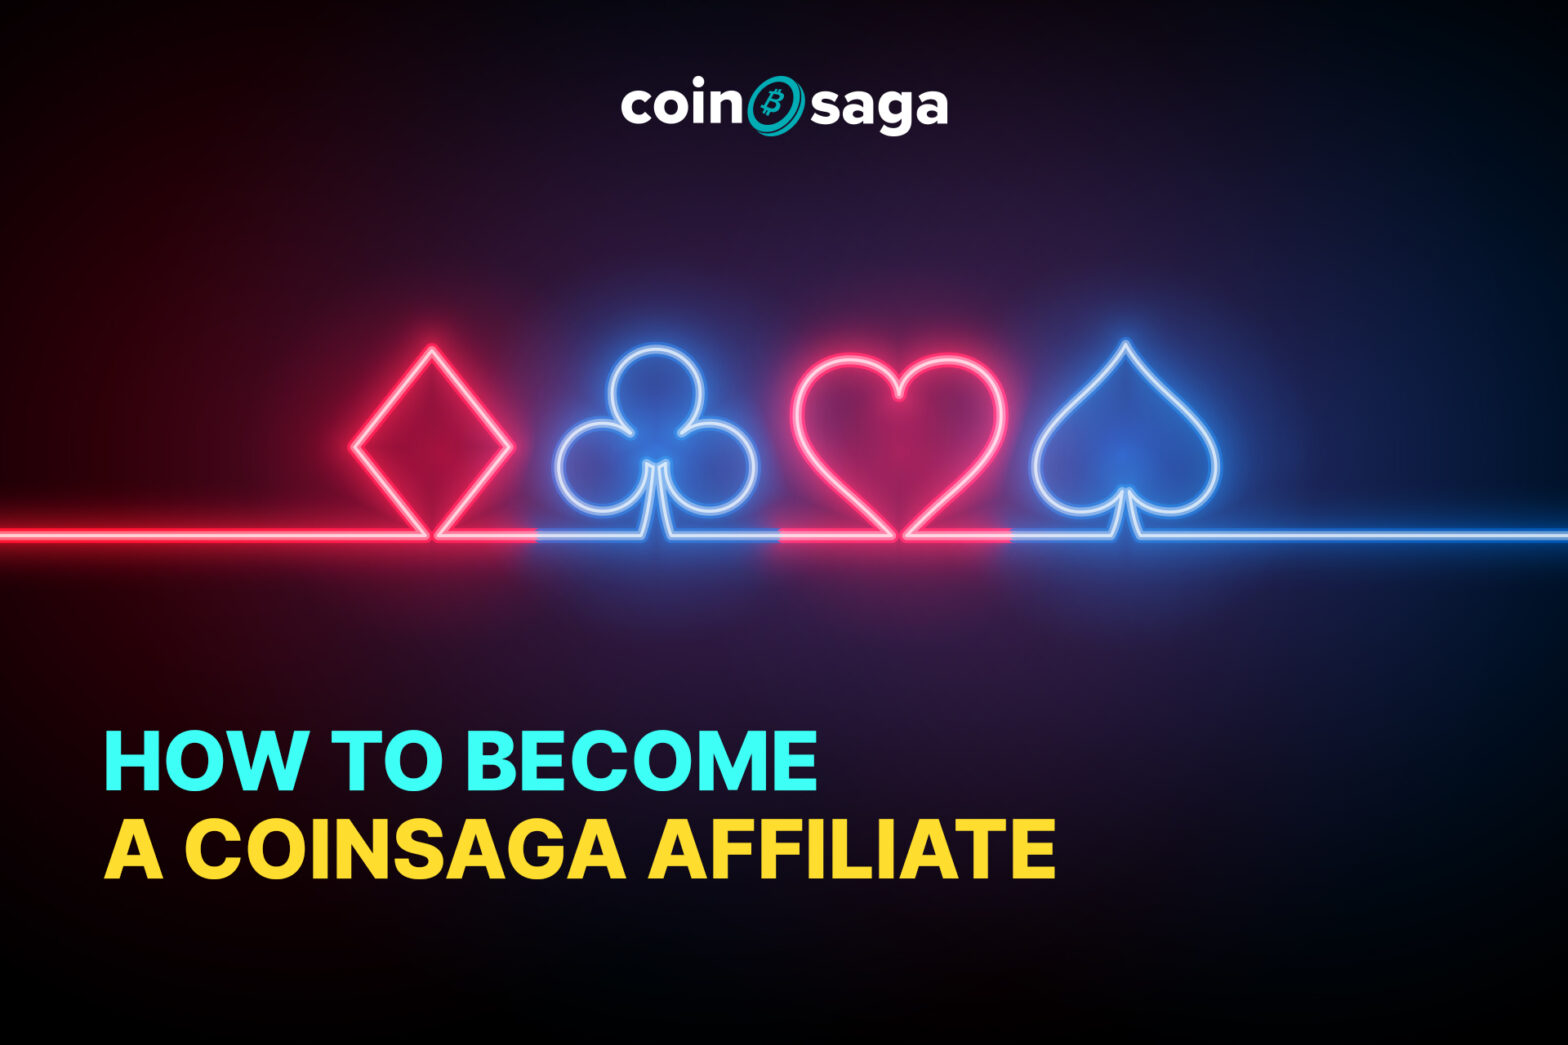 coinsaga affiliate